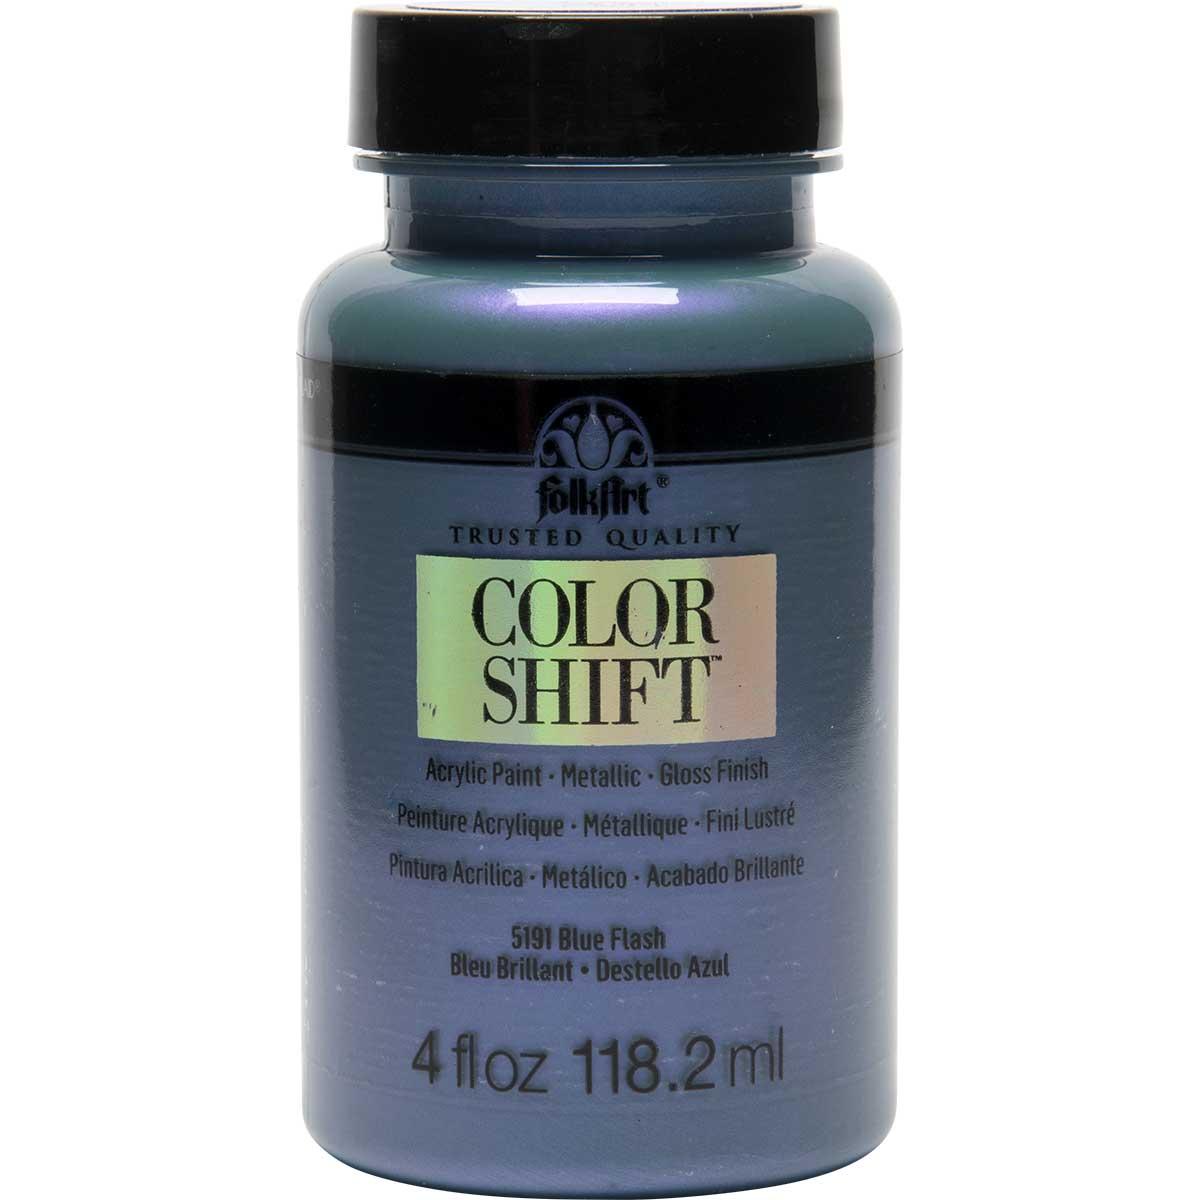 FolkArt ® Color Shift™ Acrylic Paint - Blue Flash, 4 oz.